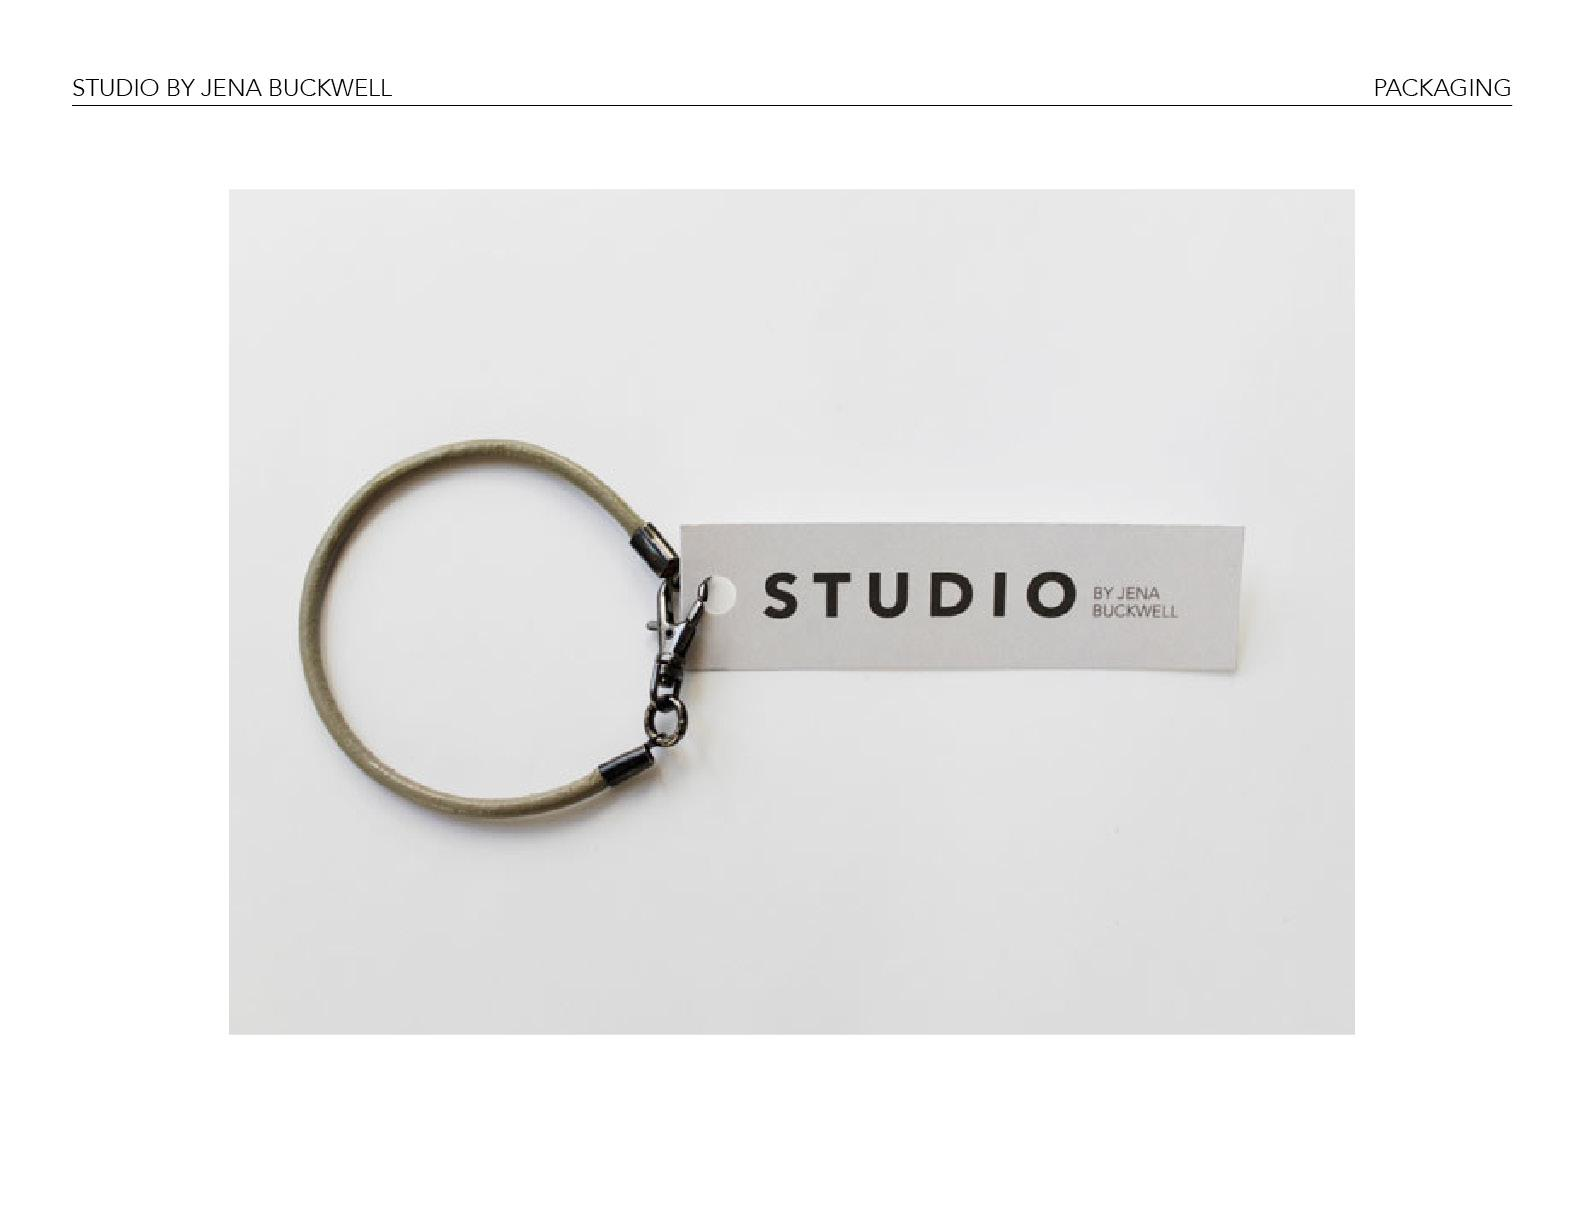 Studio, by Jena Buckwell - image 12 - student project